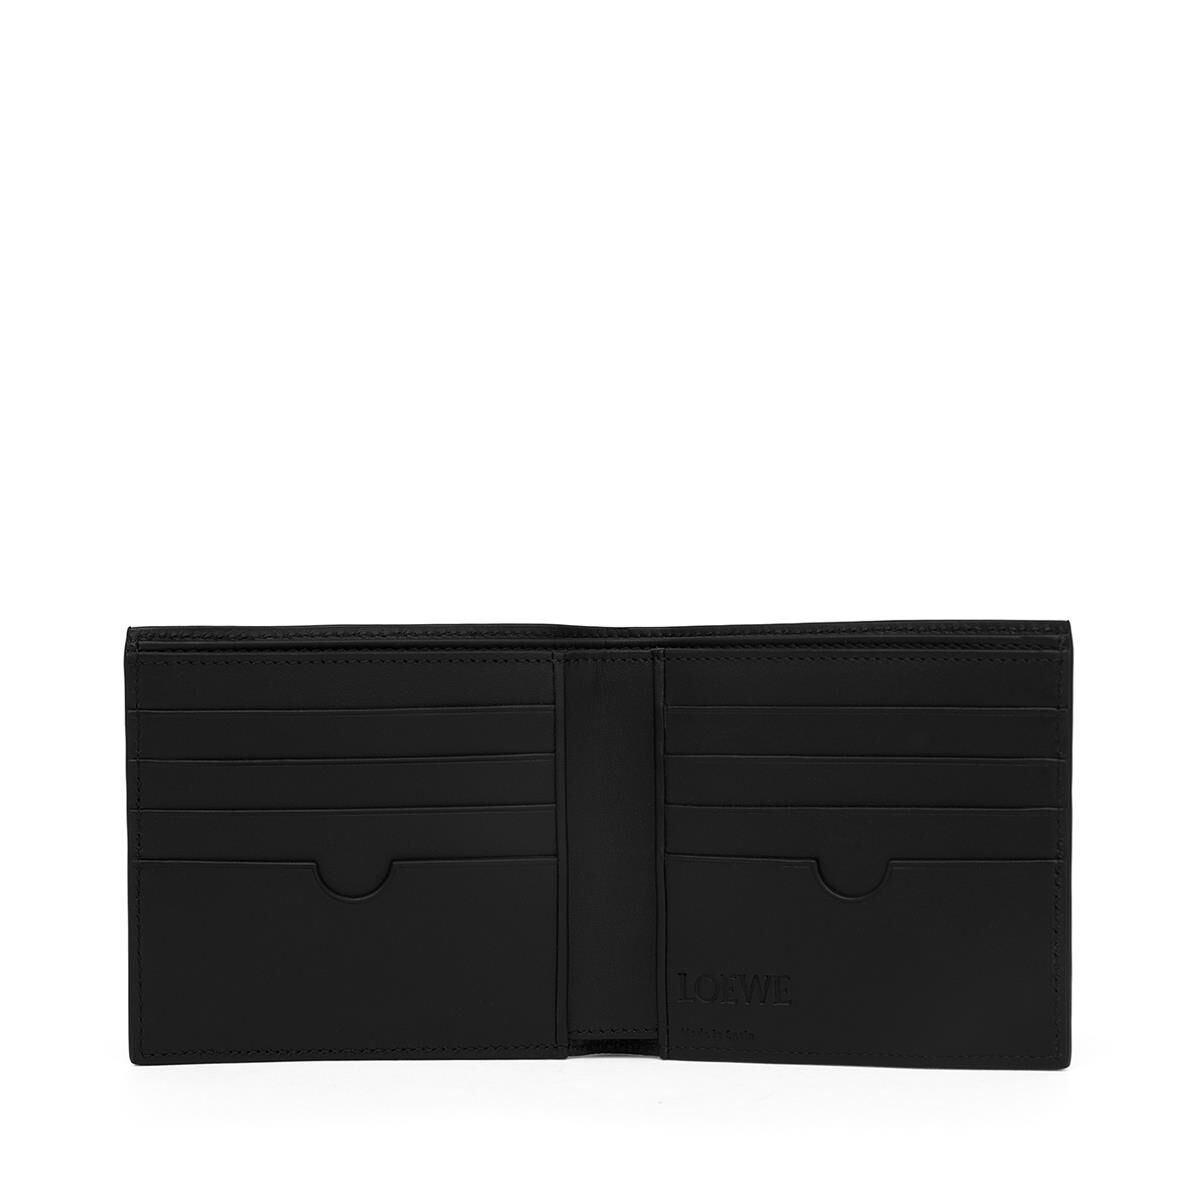 LOEWE Bifold Wallet 黑色 all